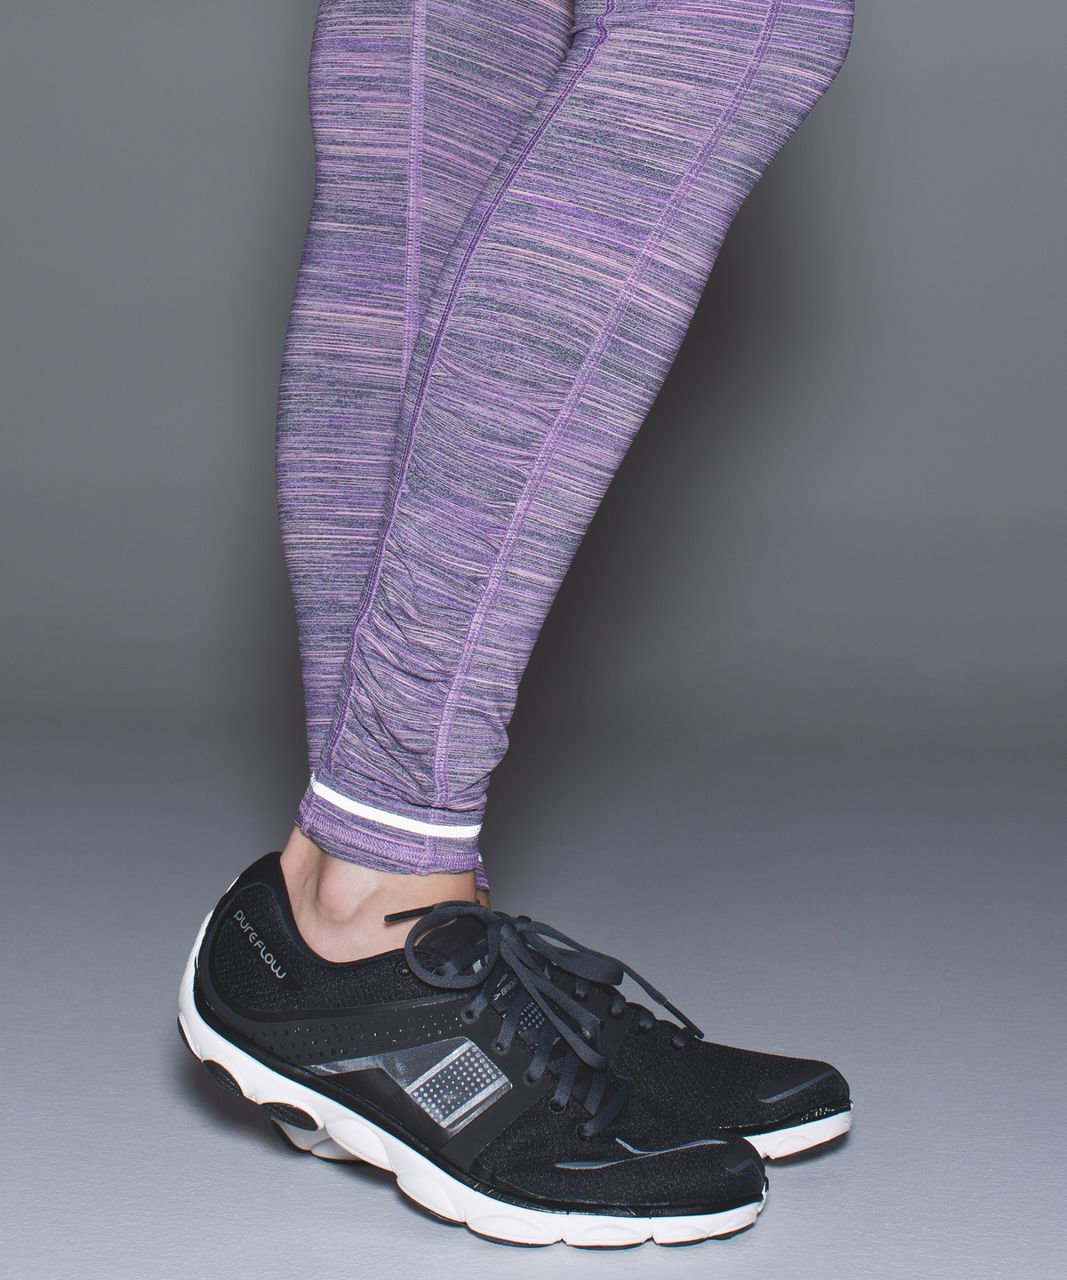 Lululemon Speed Tight IV - Space Dye Camo Tender Violet Black Grape